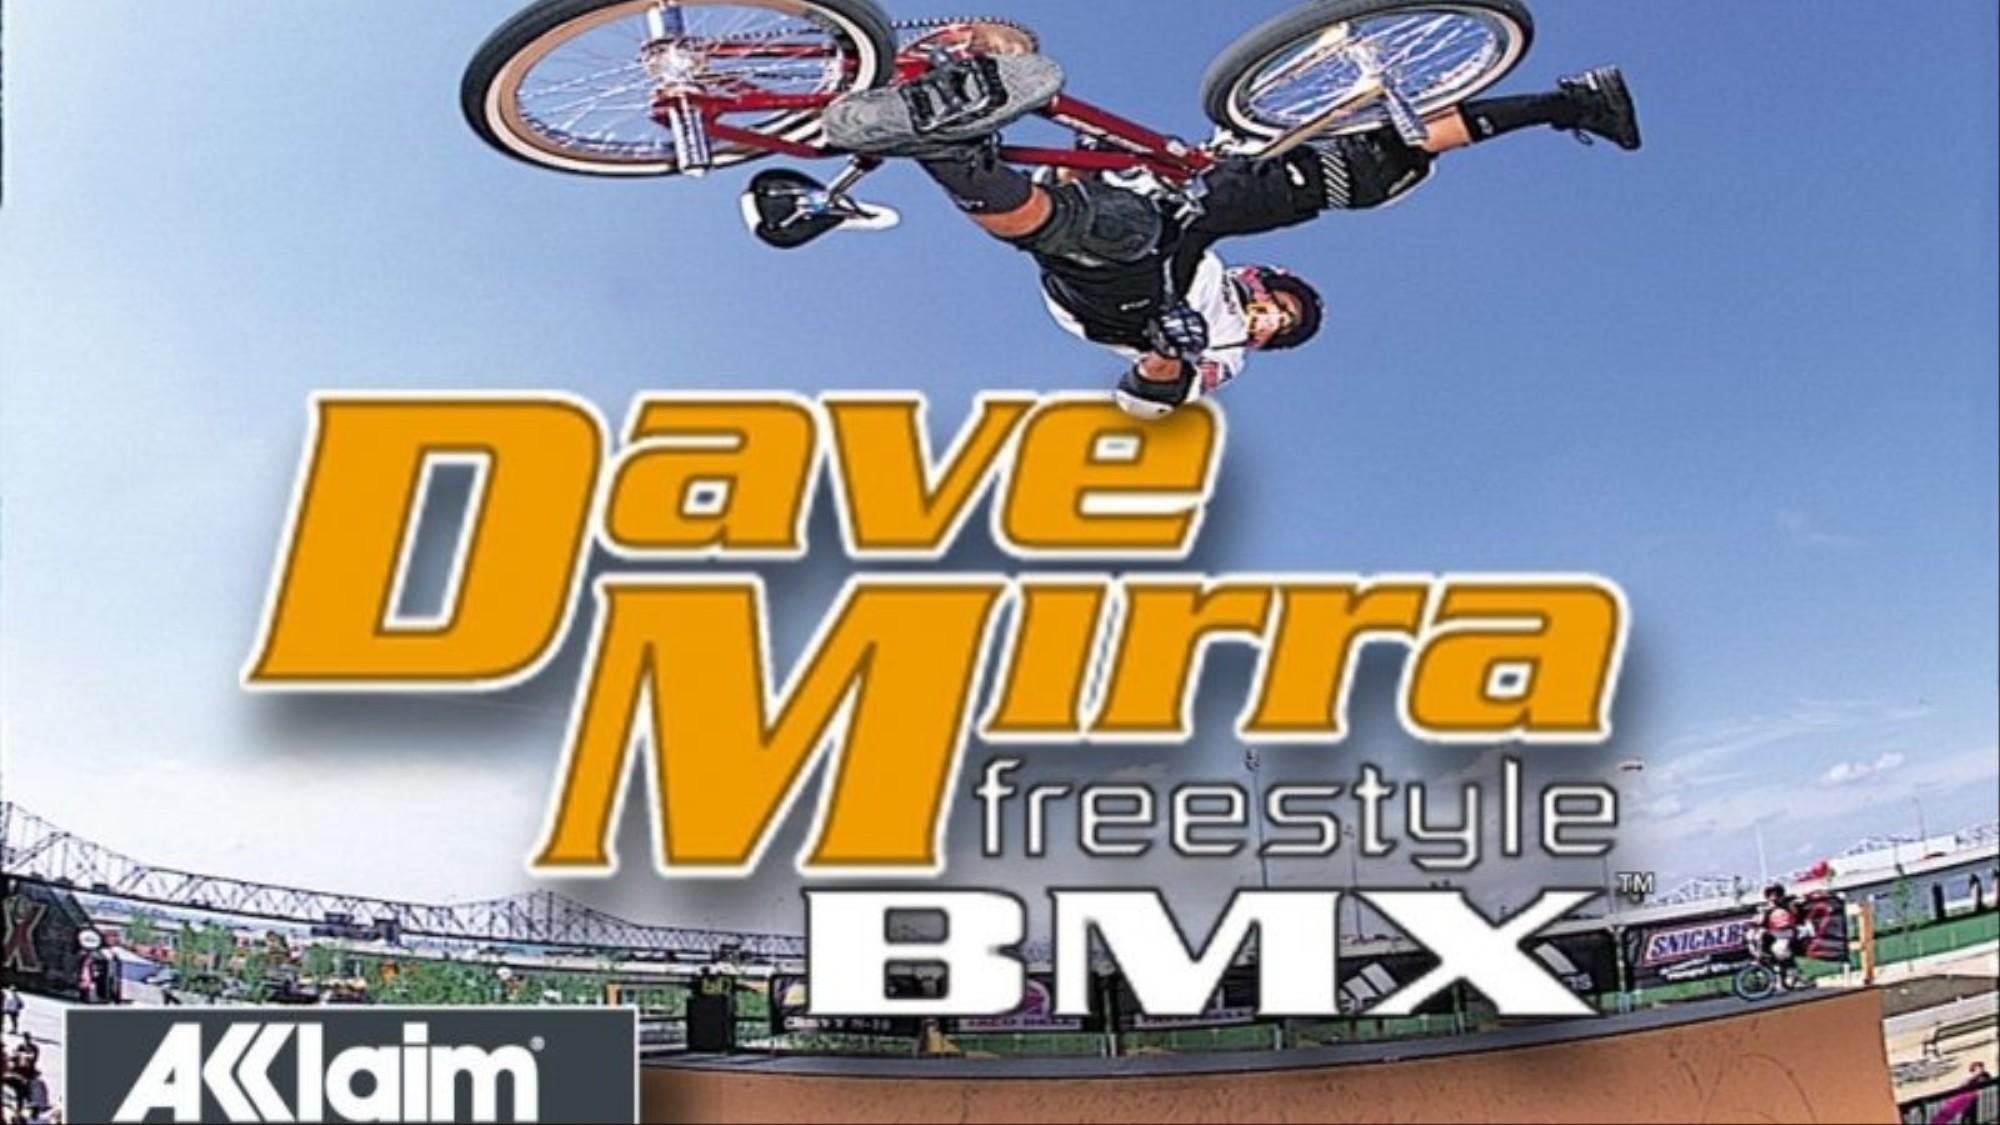 Dave Mirra's Freestyle BMX' Changed My Musical Landscape